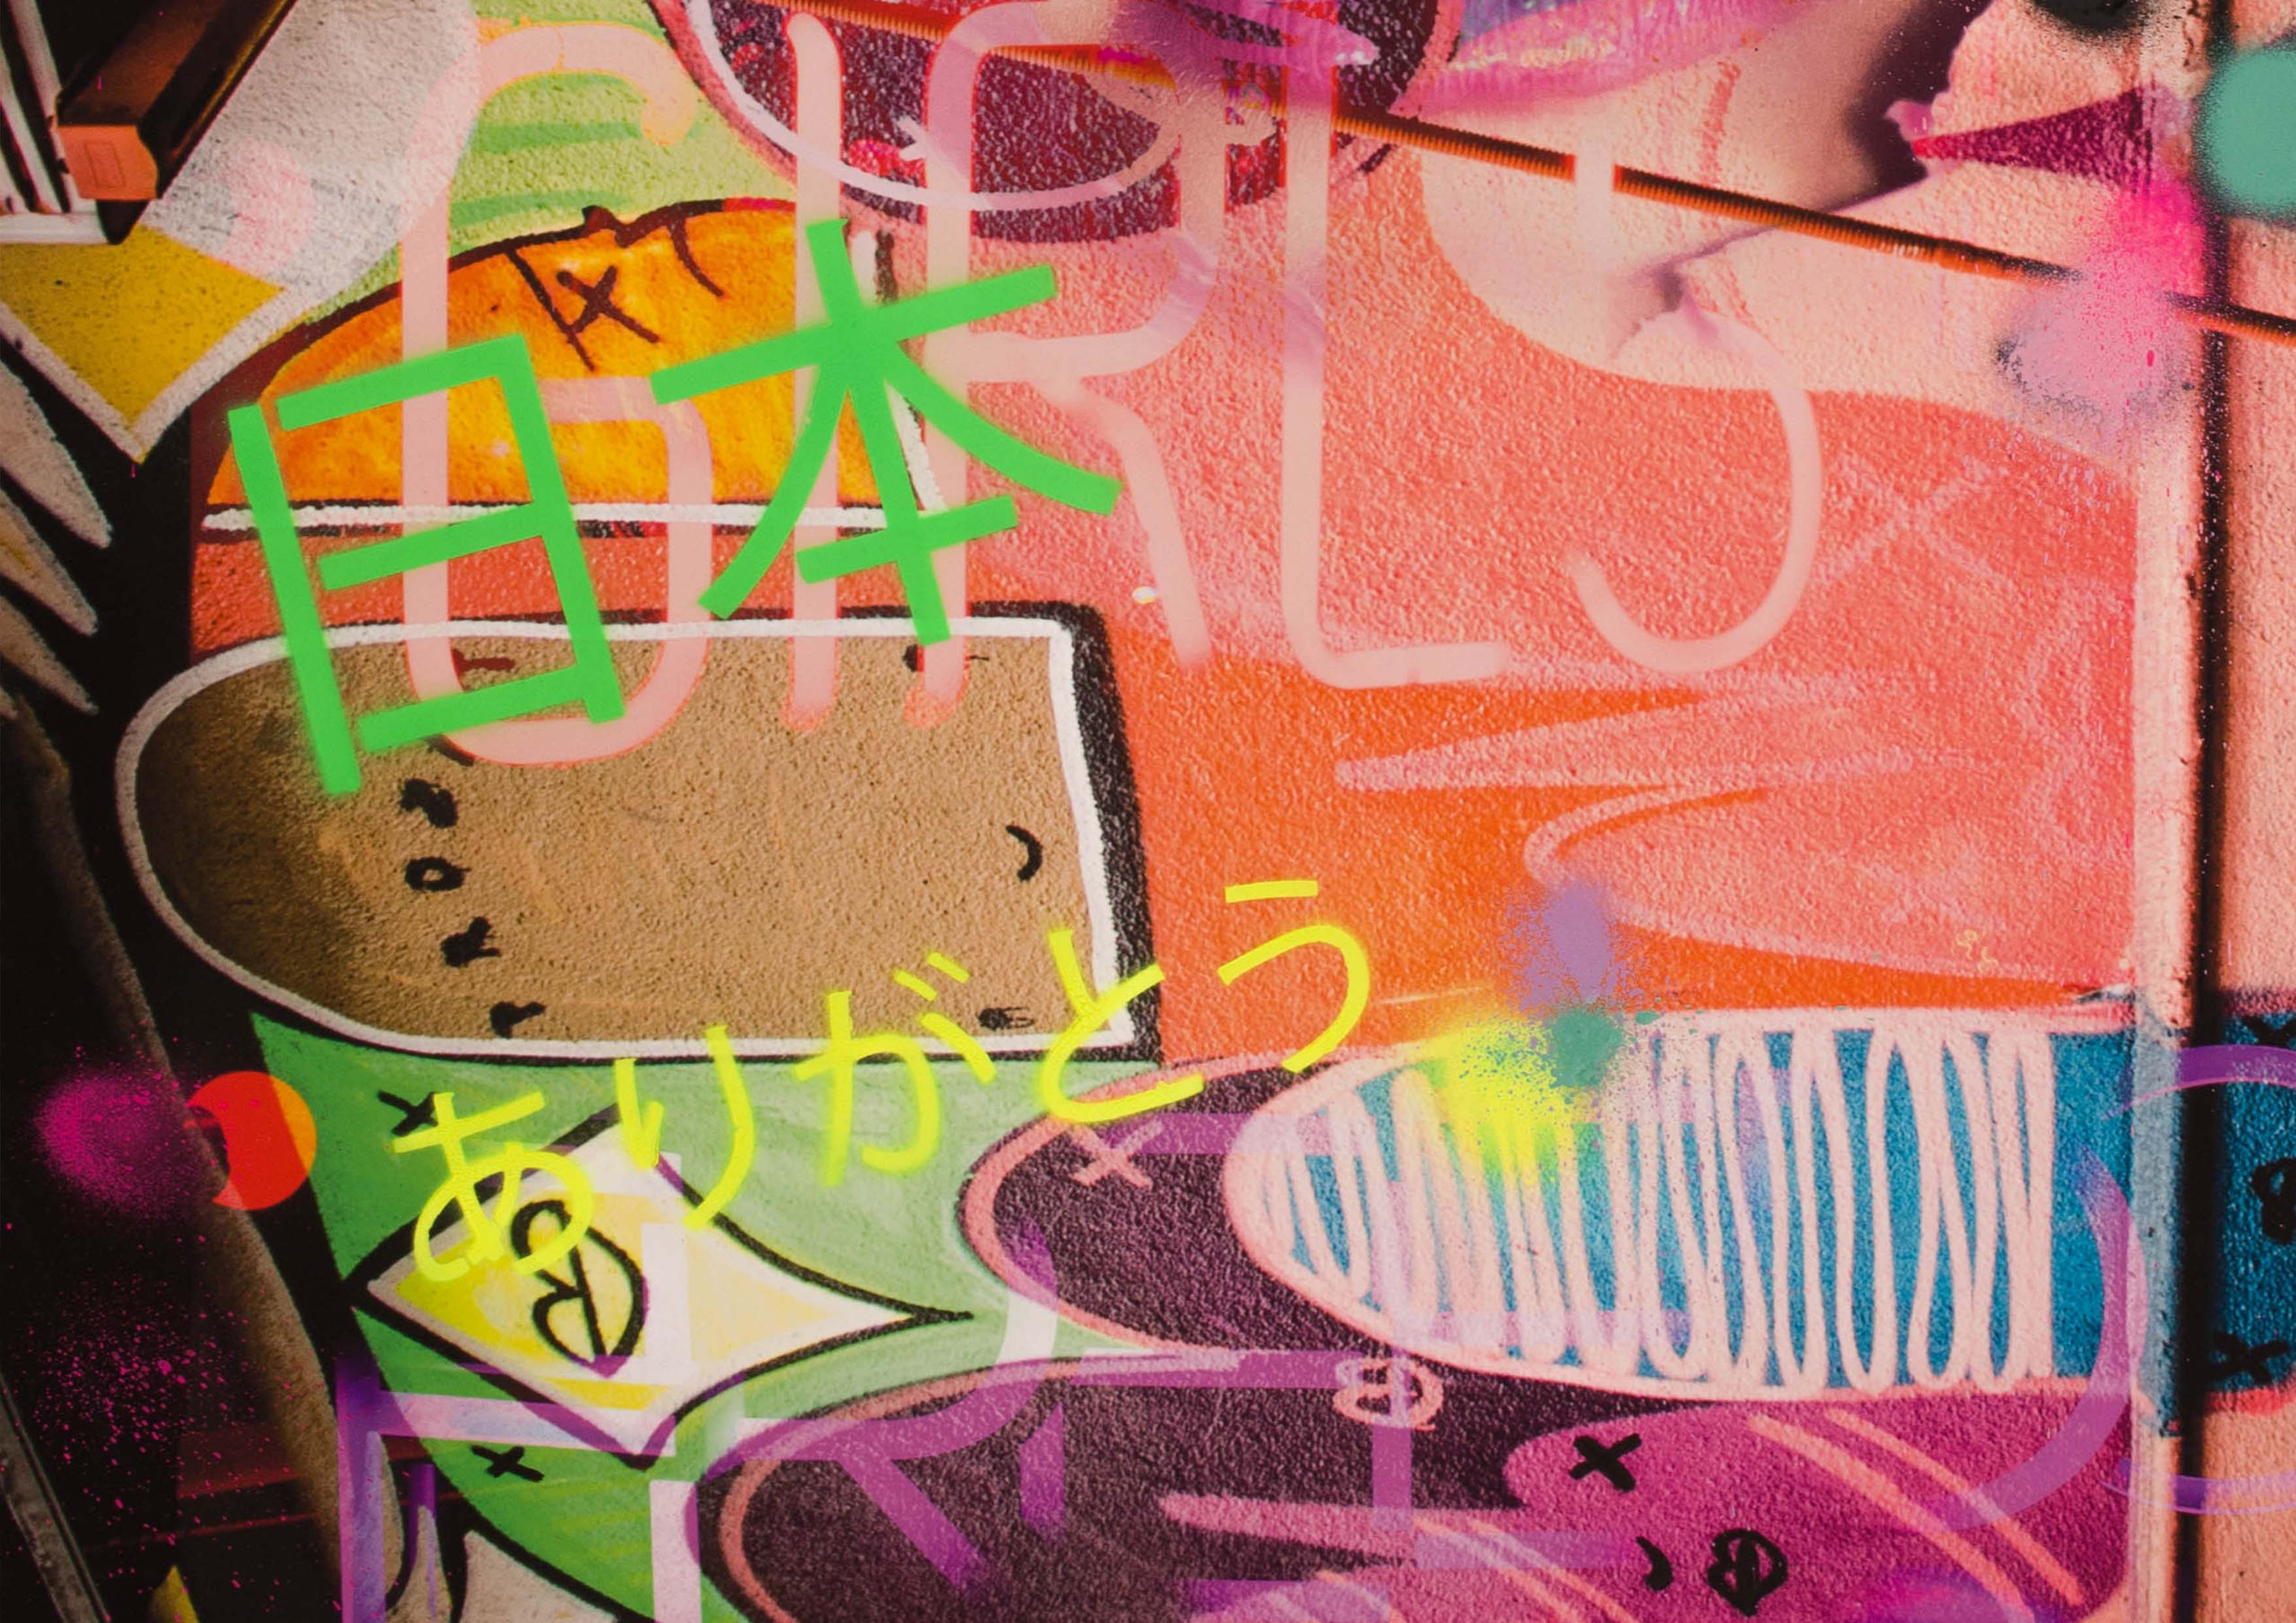 NATALIE-OTALORA-ART-DIGITAL-TOKIO-LIPS-DETAIL-2